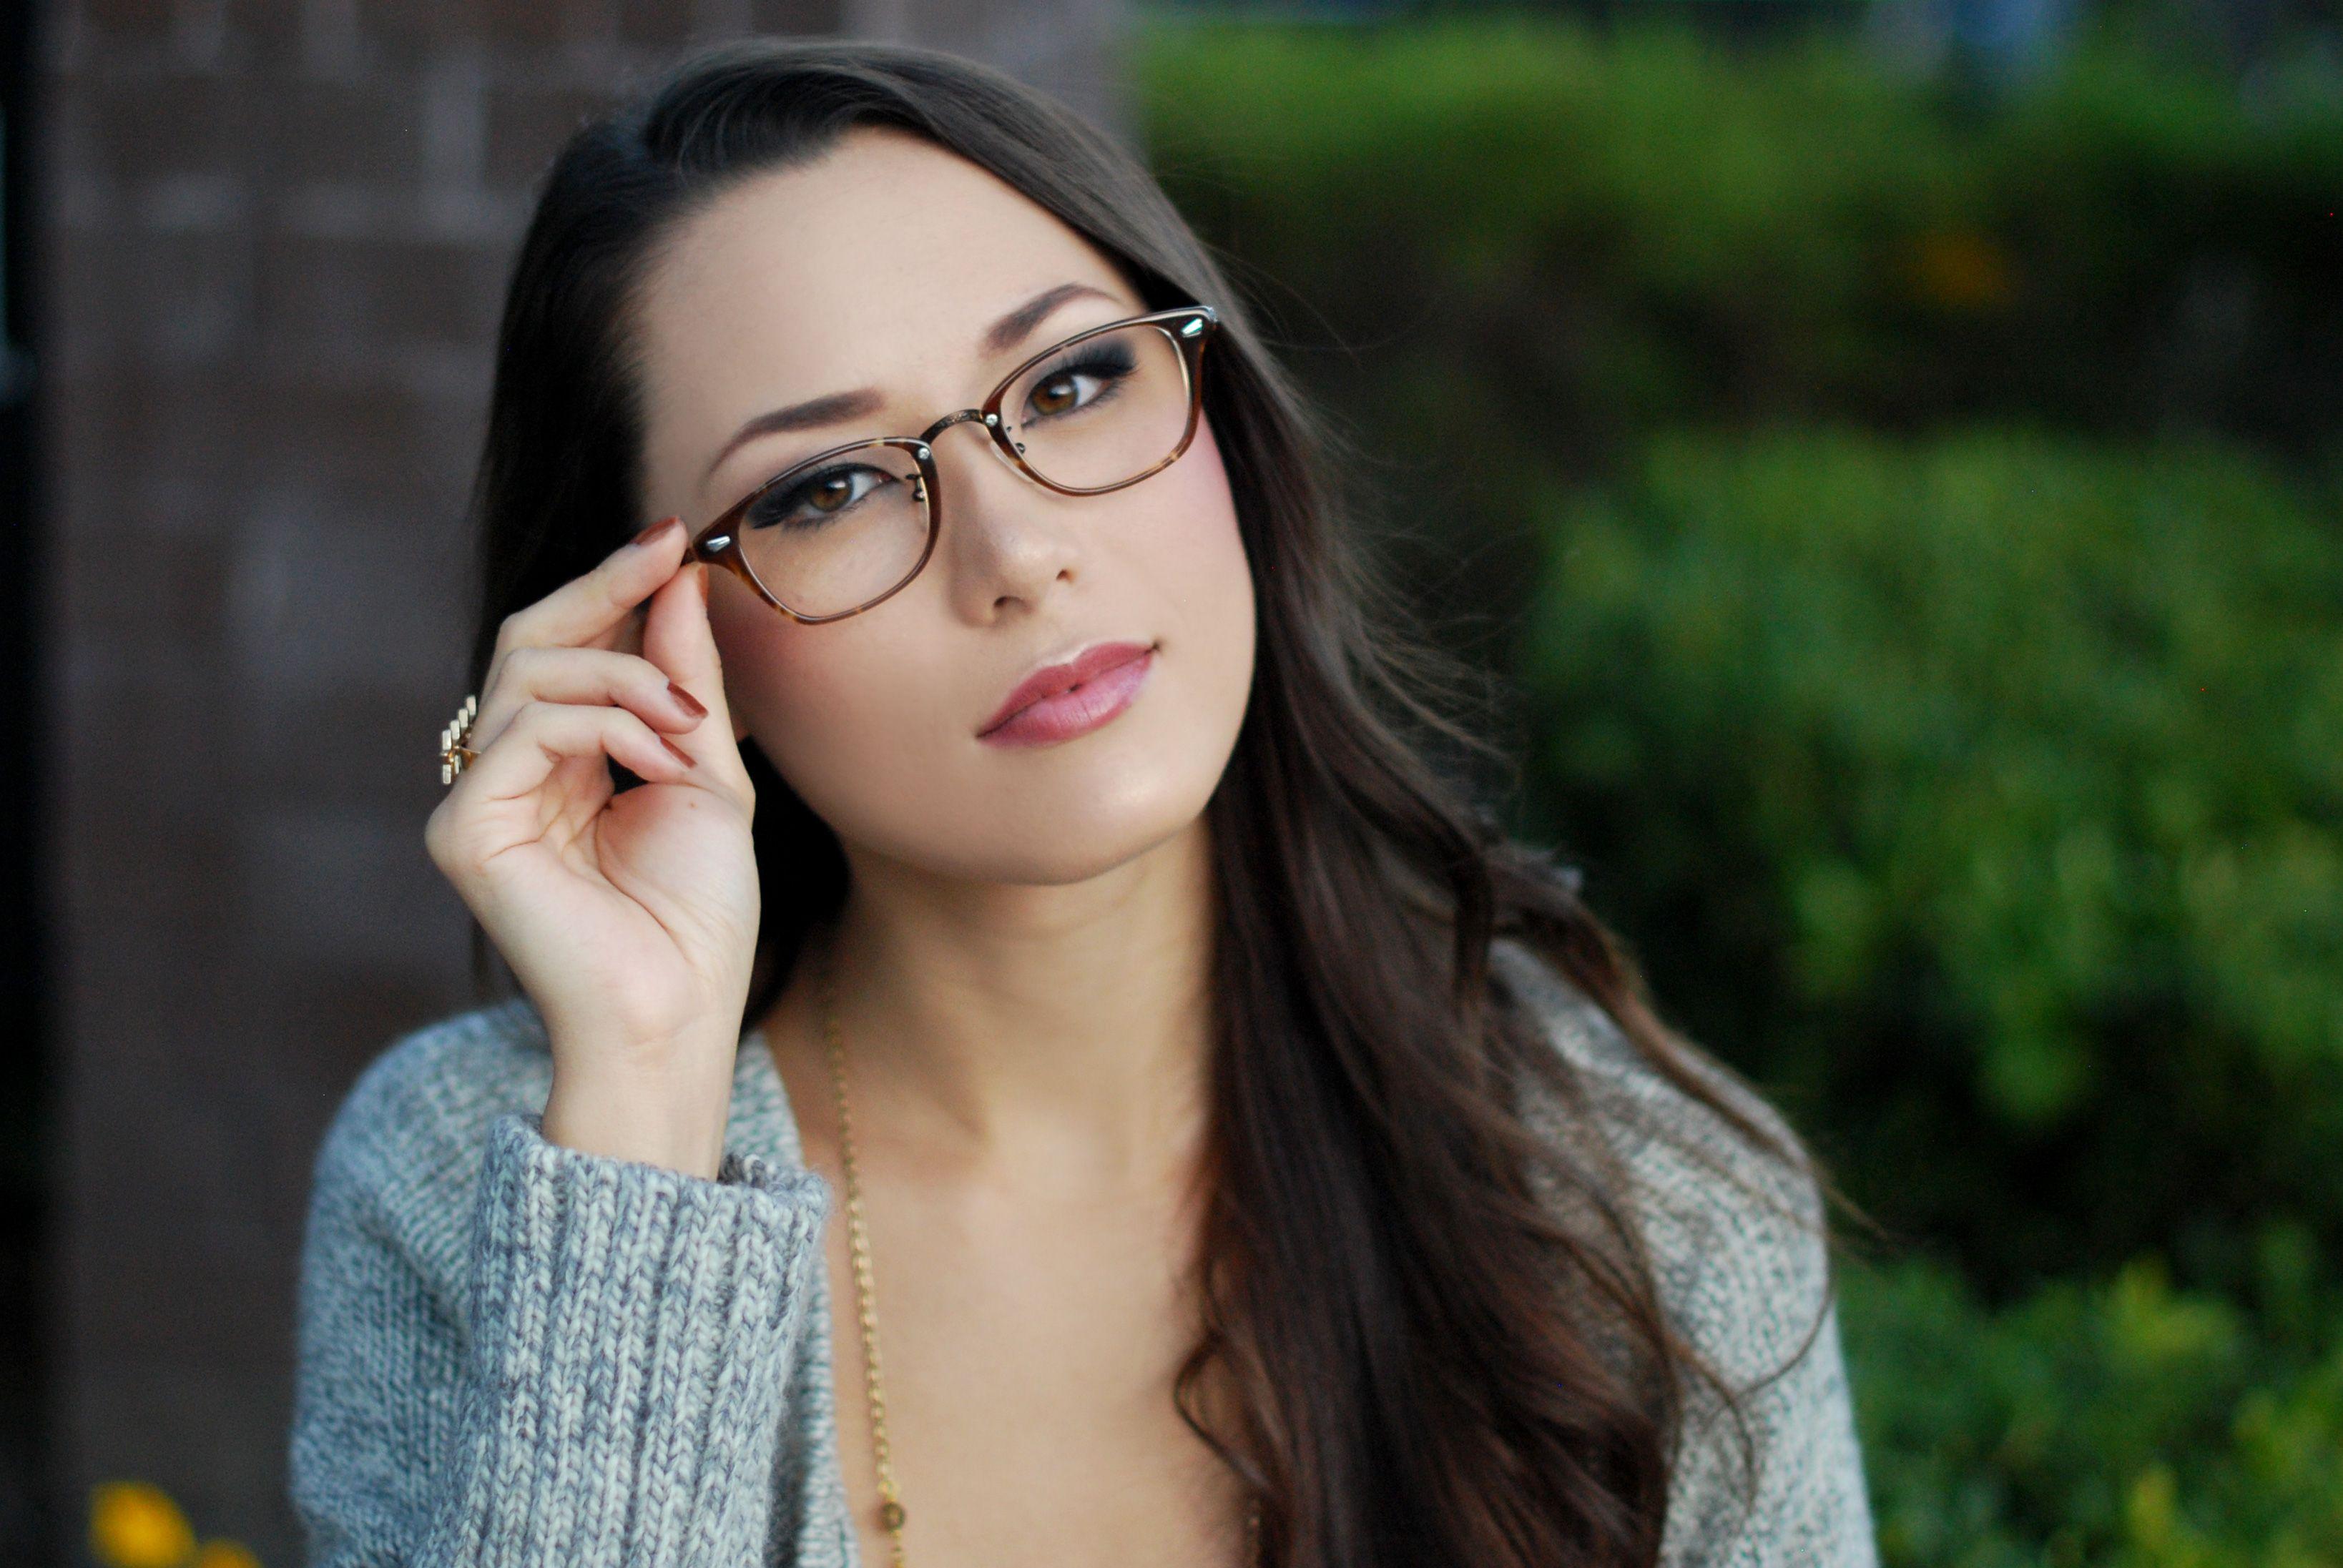 Jessica from blog wears seesun 4136